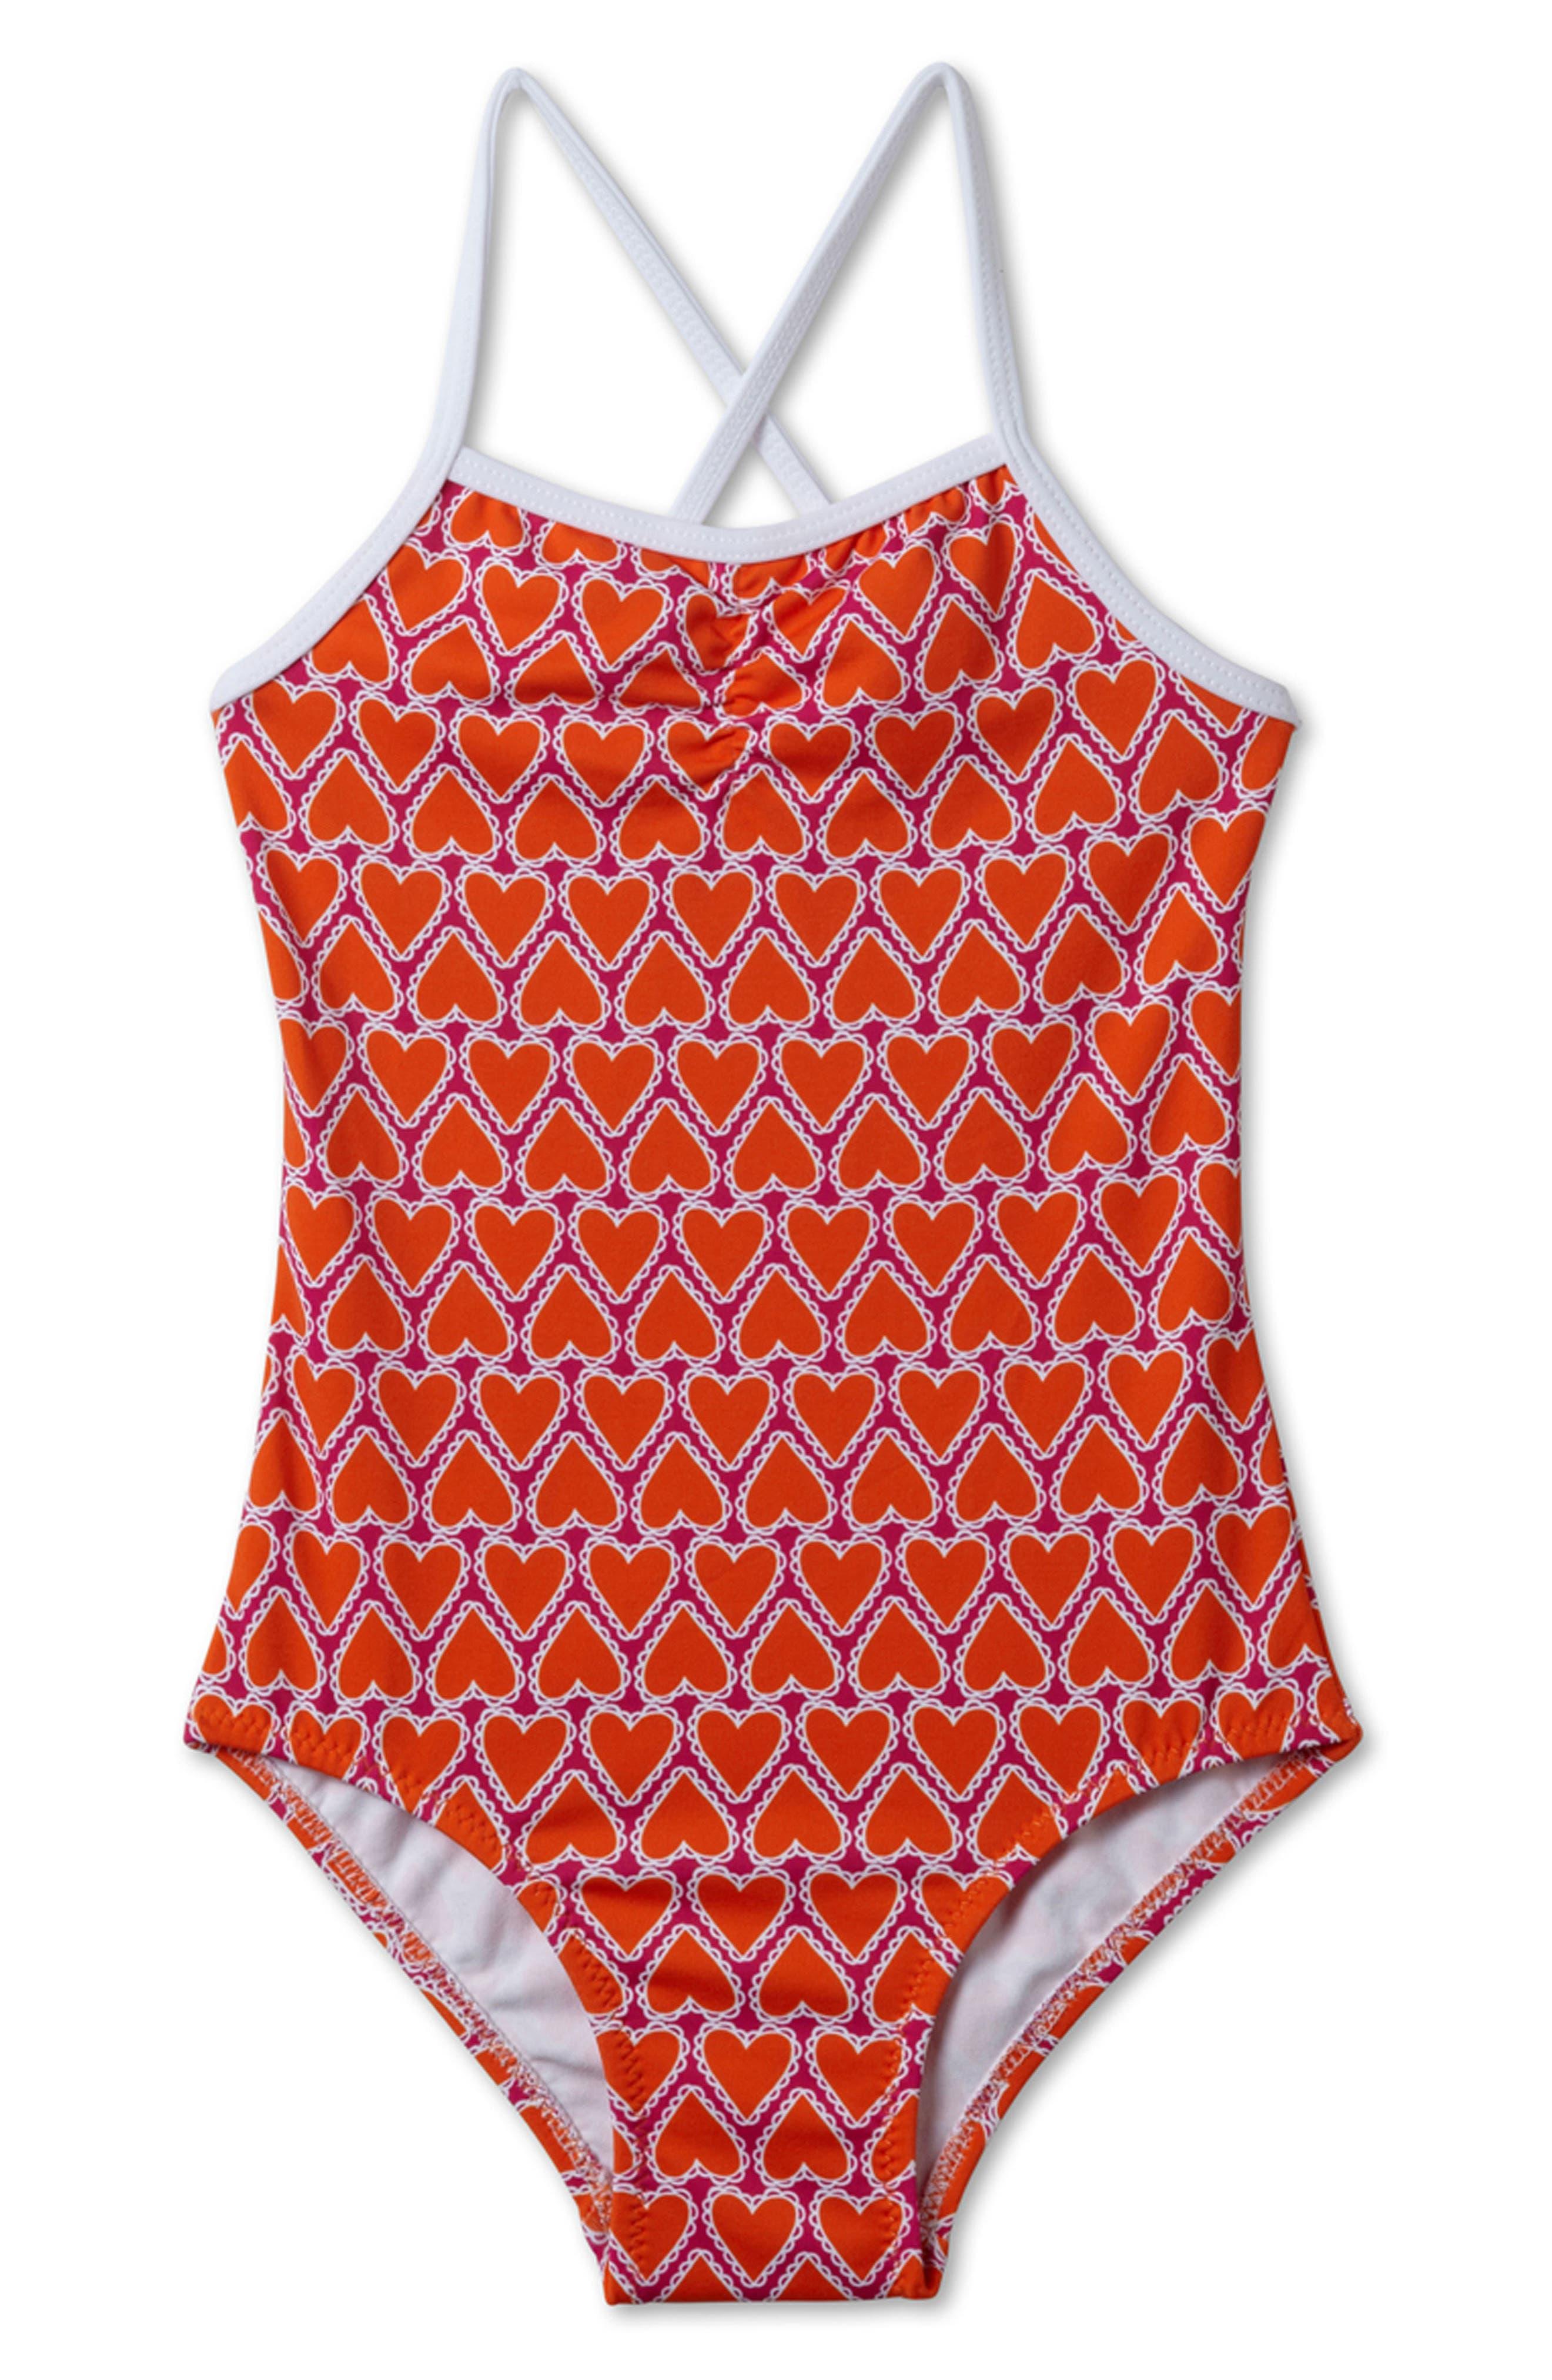 Main Image - Stella Cove Heart Print One-Piece Swimsuit (Toddler Girls & Little Girls)